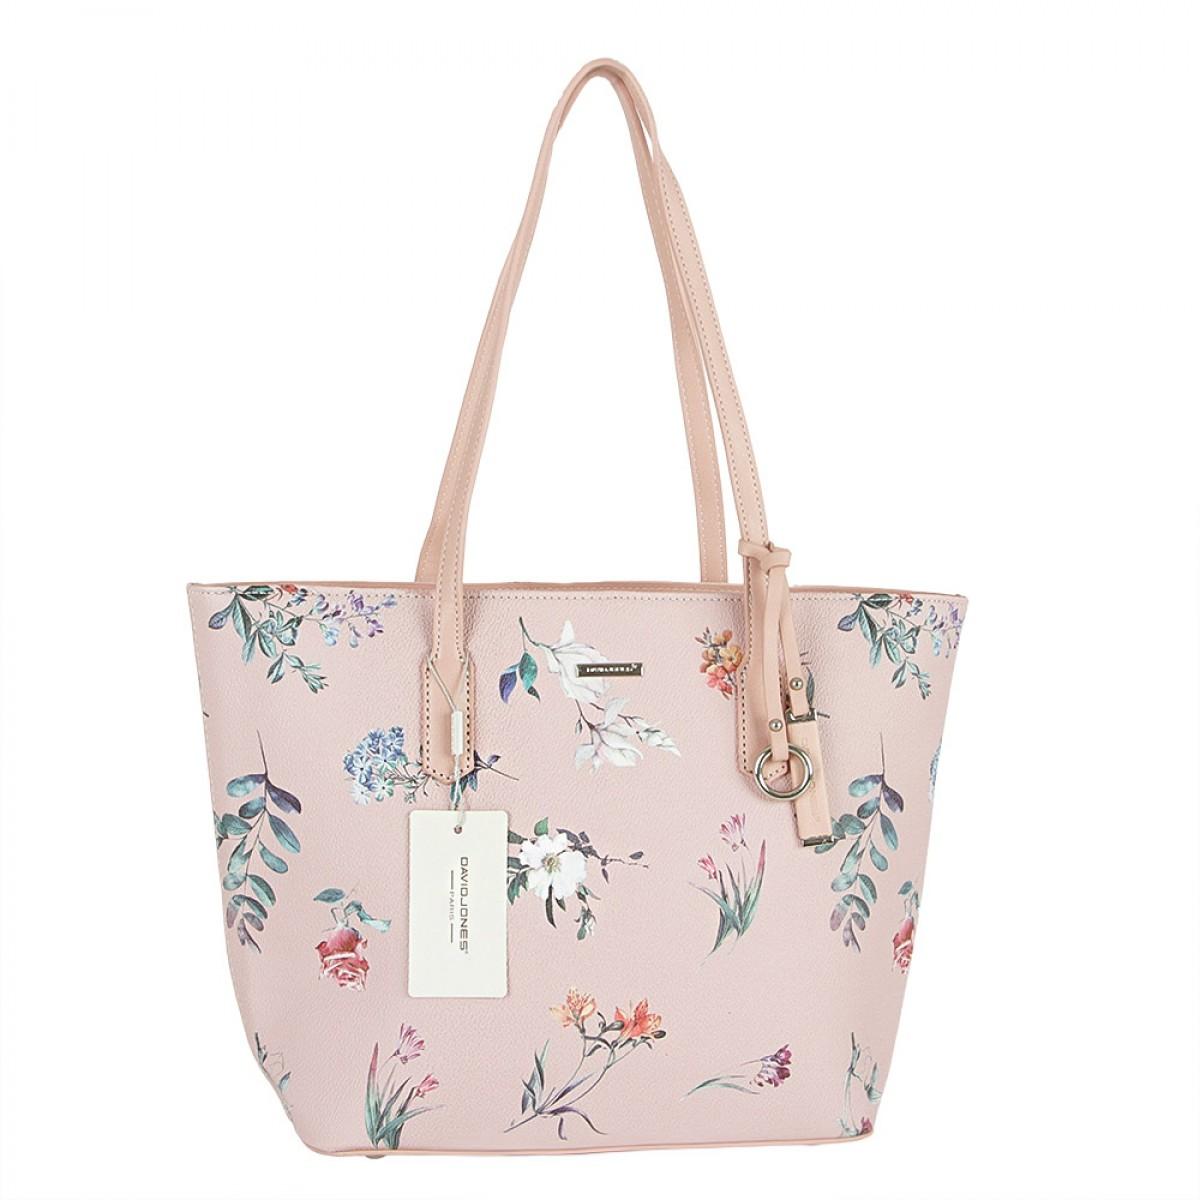 Жіноча сумка David Jones 5996-4 PINK